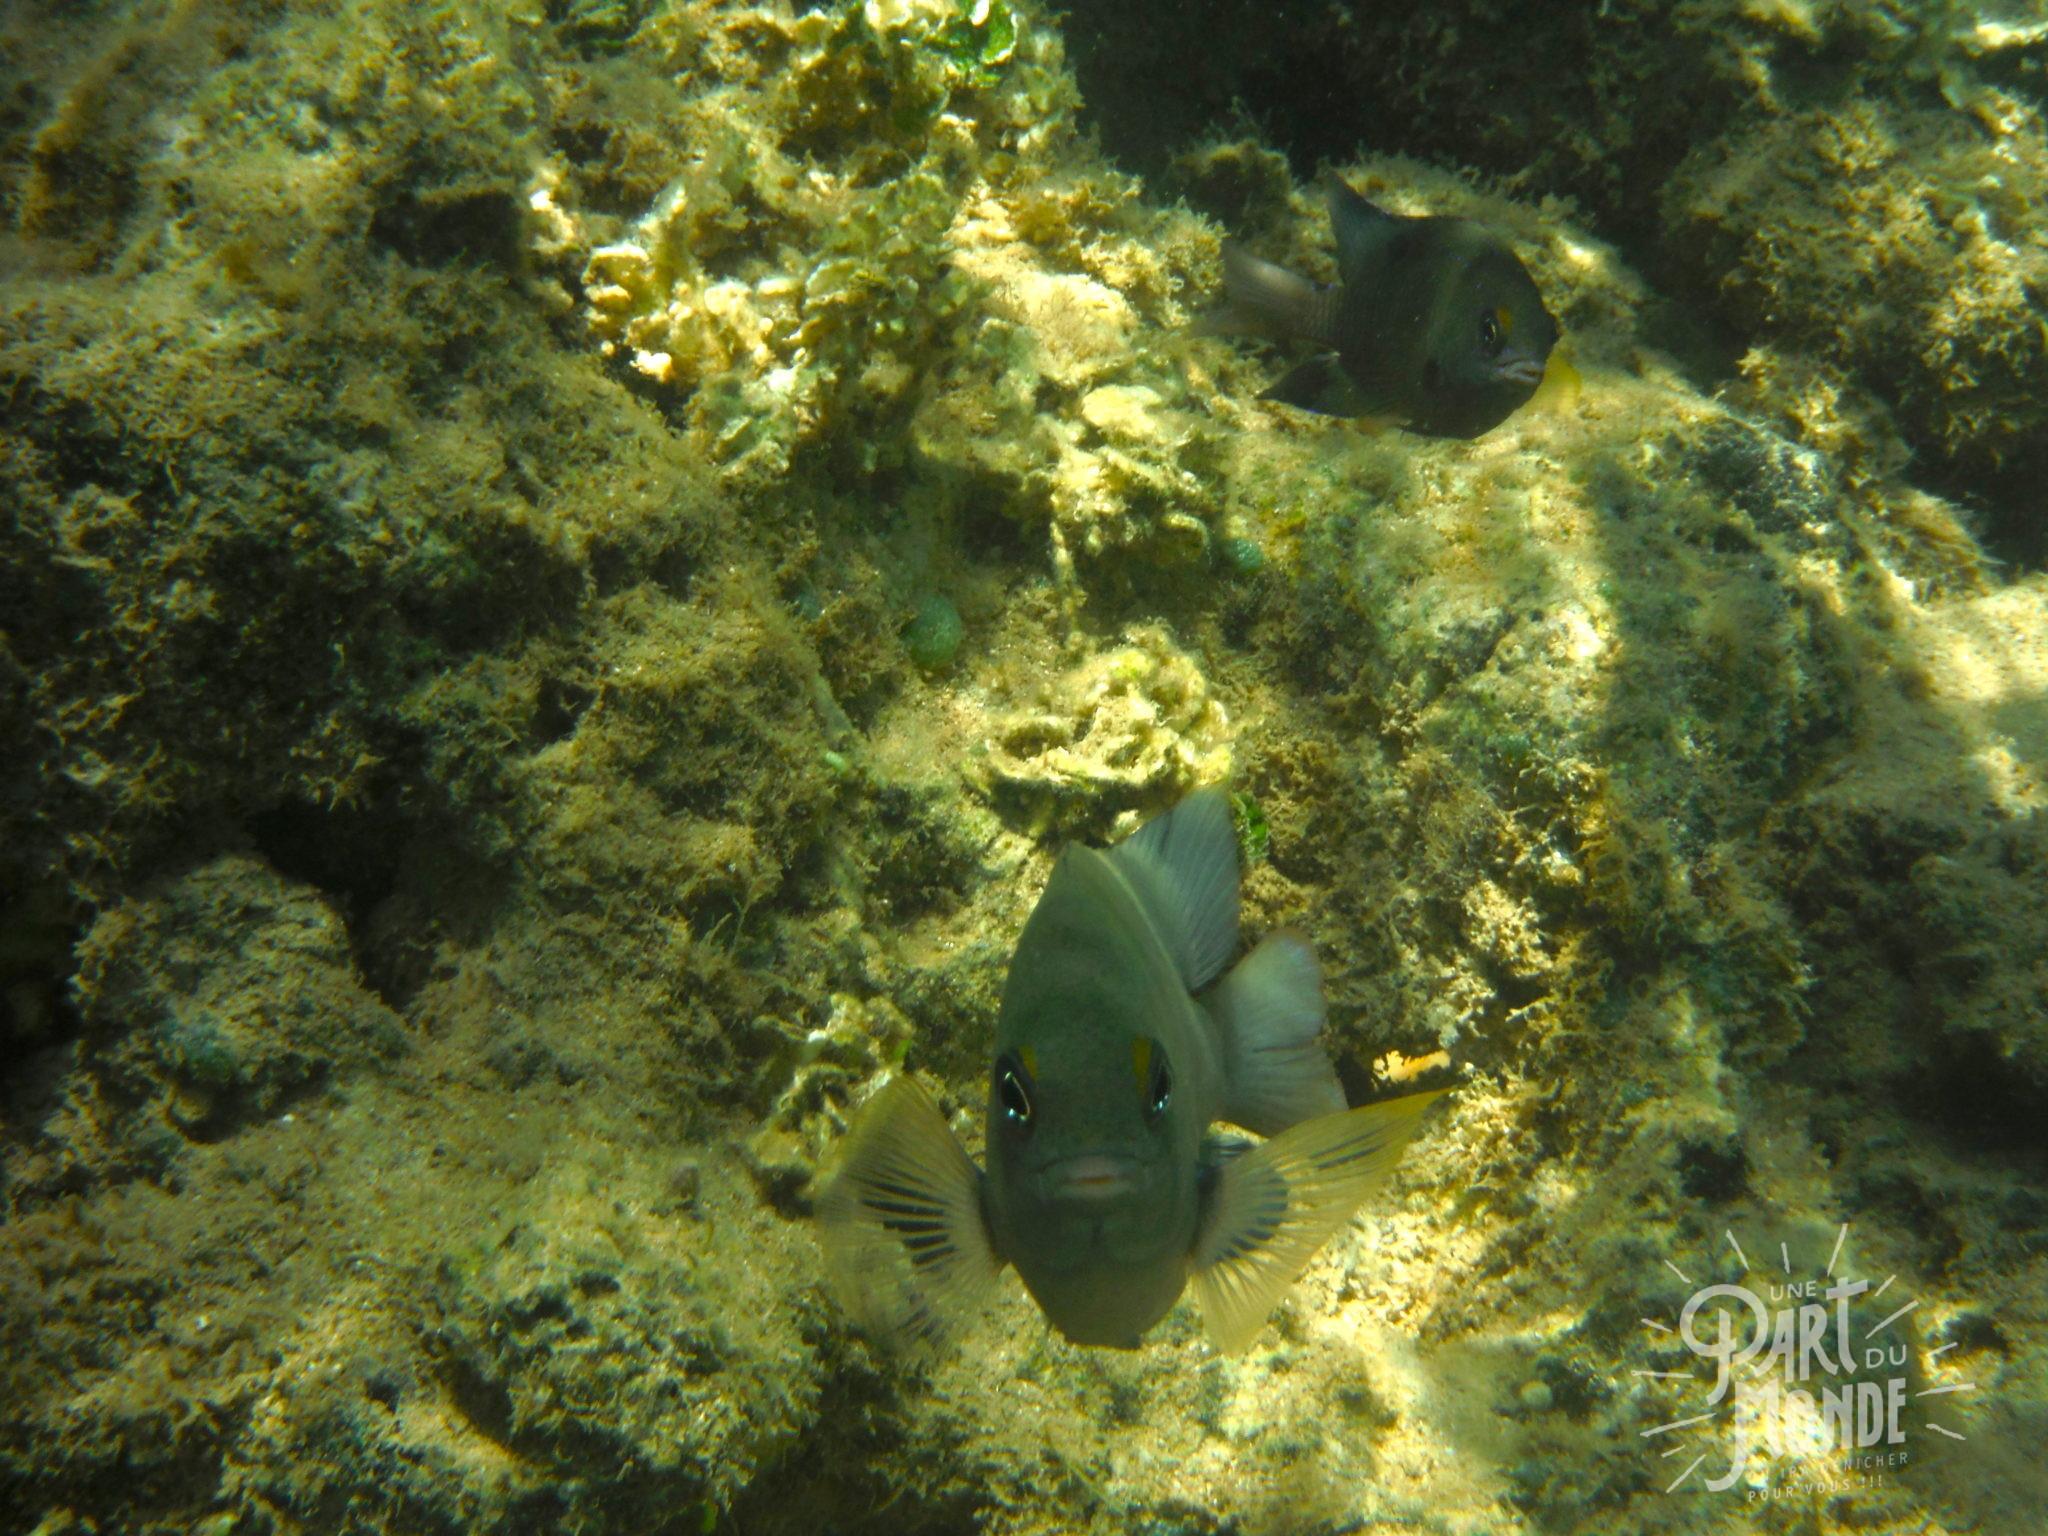 île de tinharé snorkeling